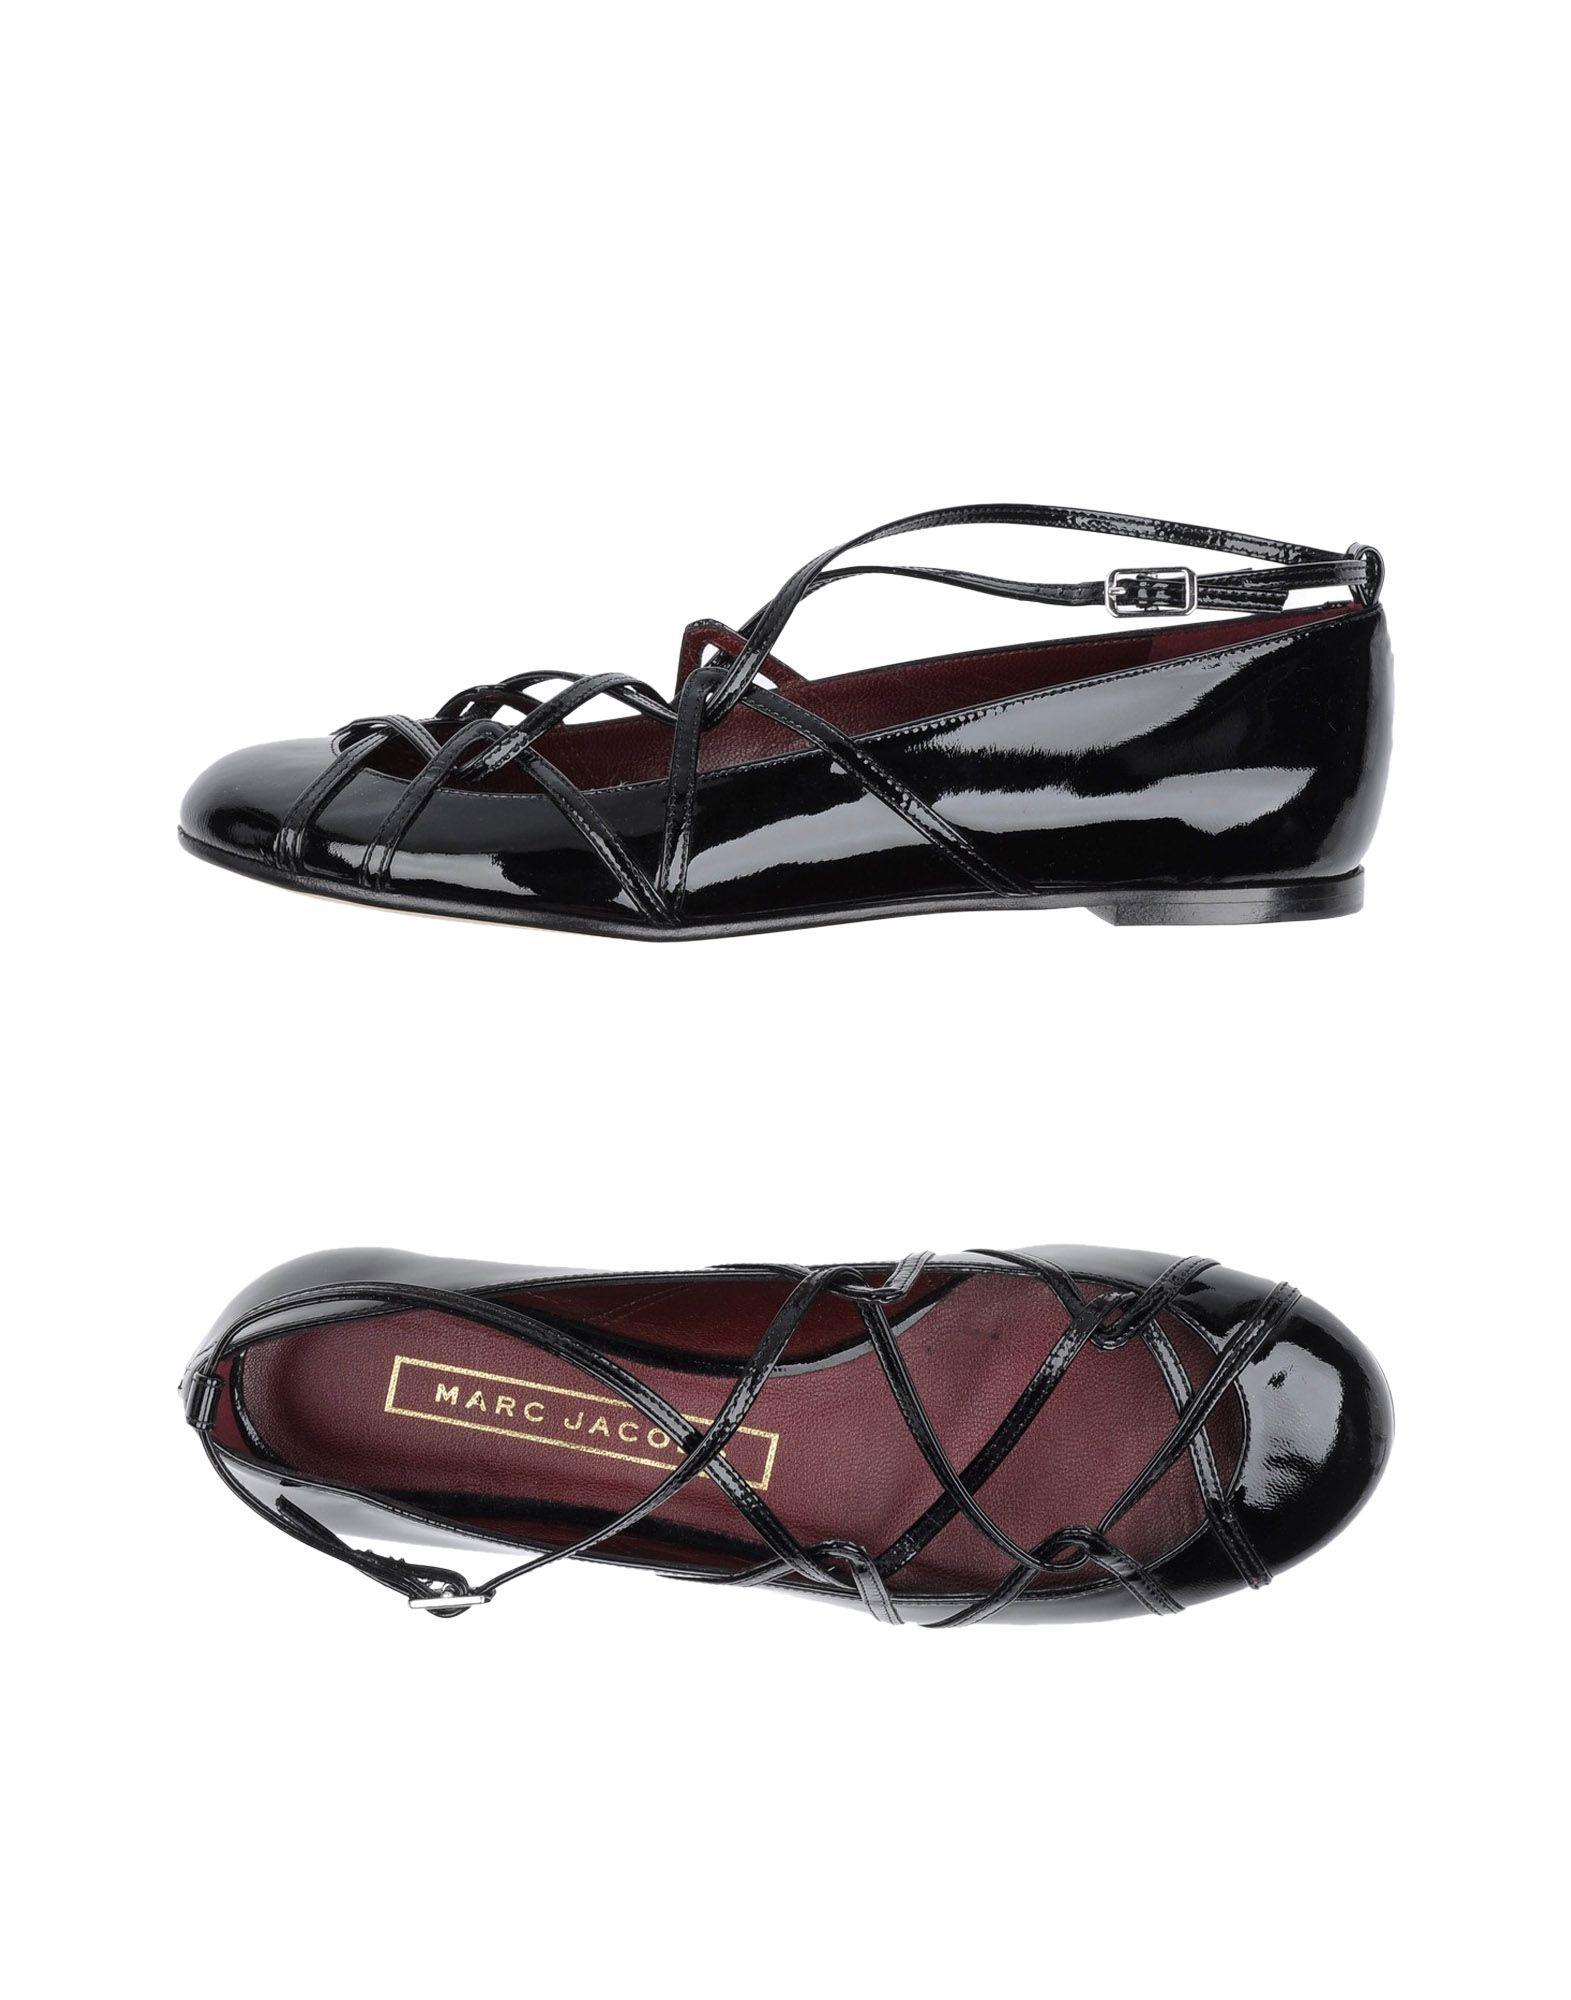 Rabatt Schuhe Marc Jacobs Ballerinas Damen  11255434JP